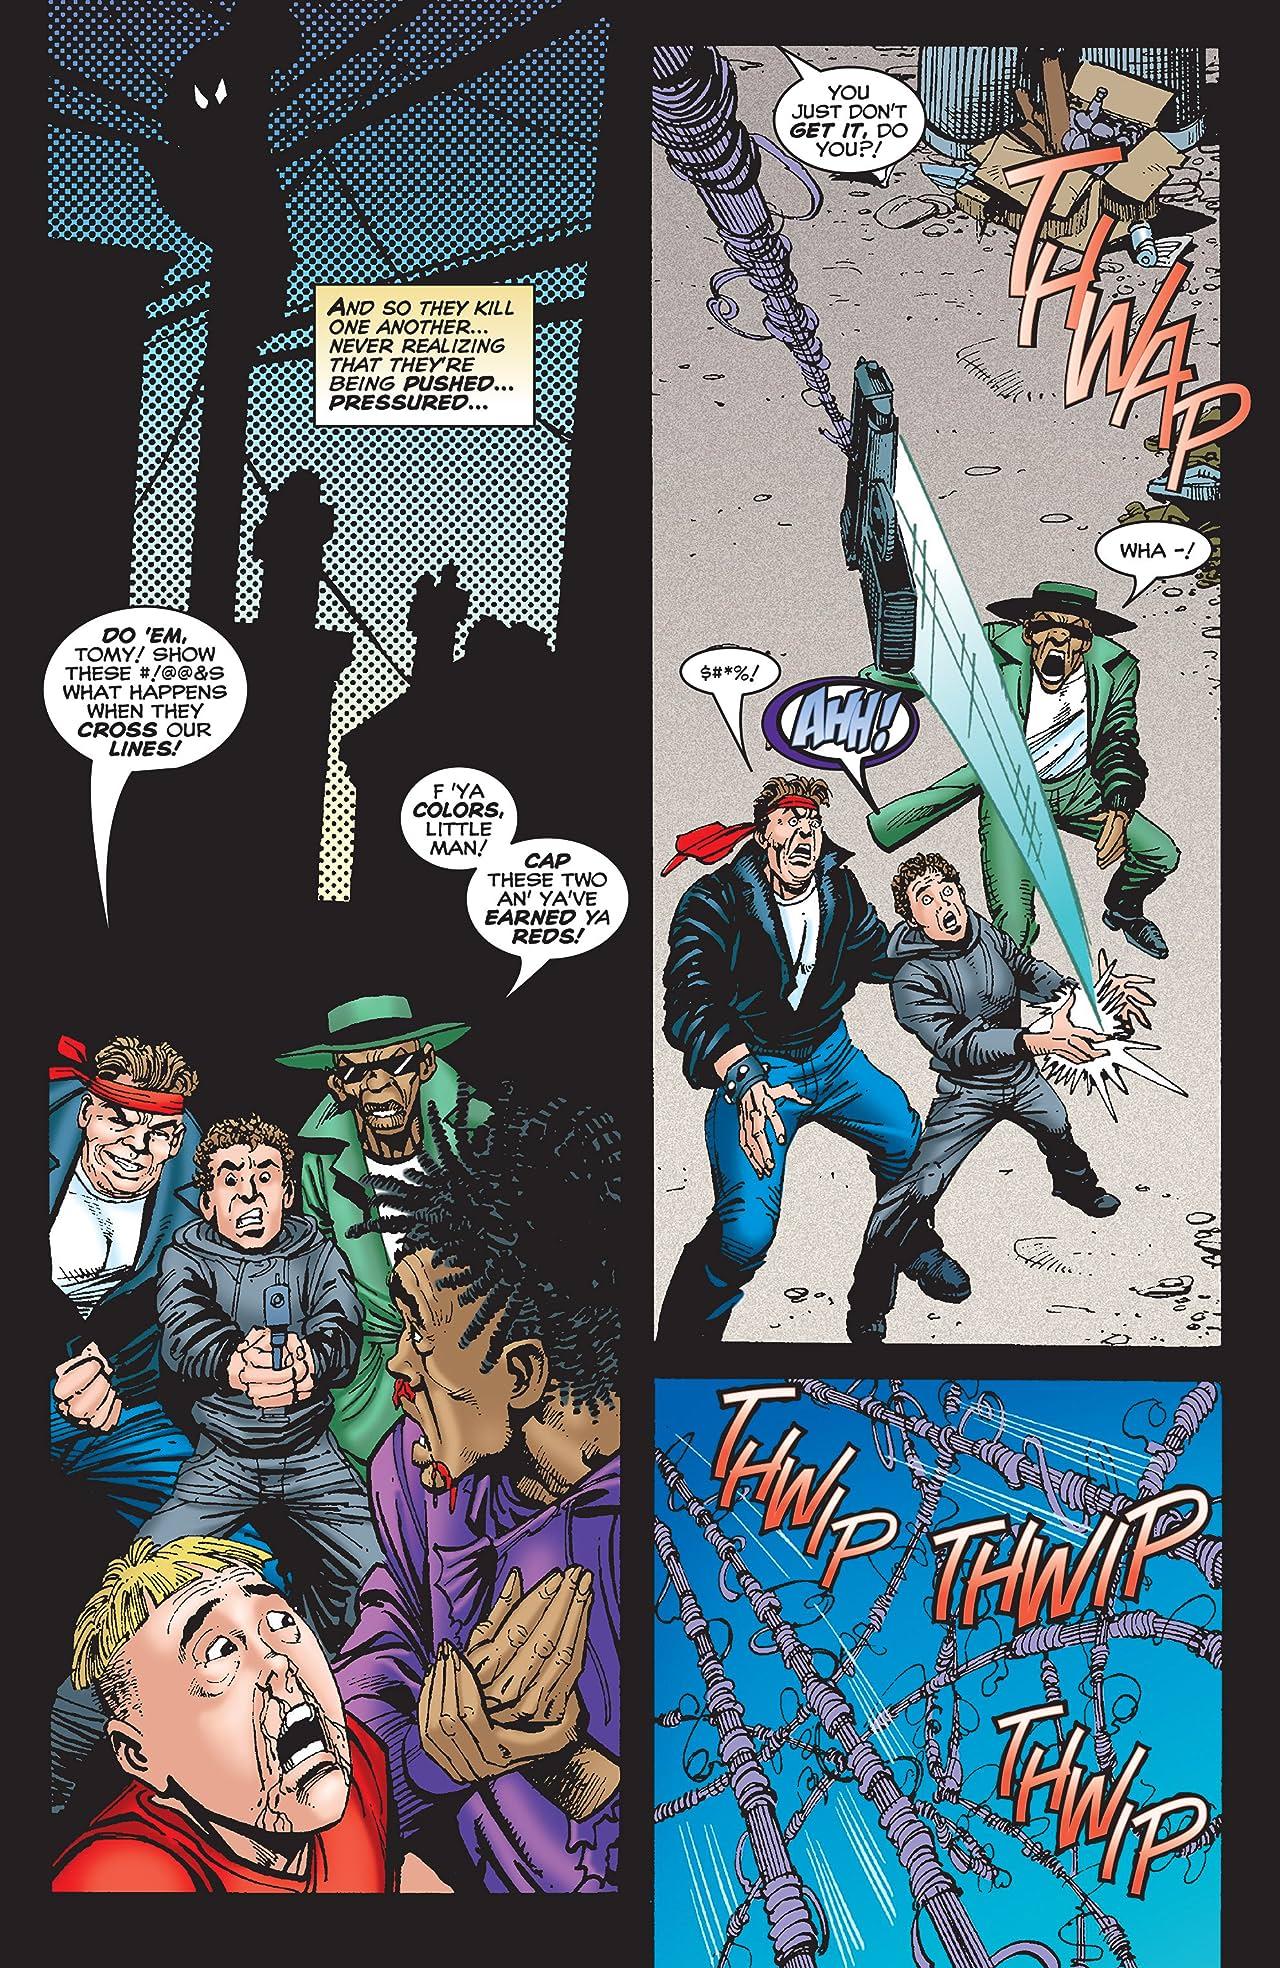 Spider-Man: The Complete Ben Reilly Epic Vol. 5